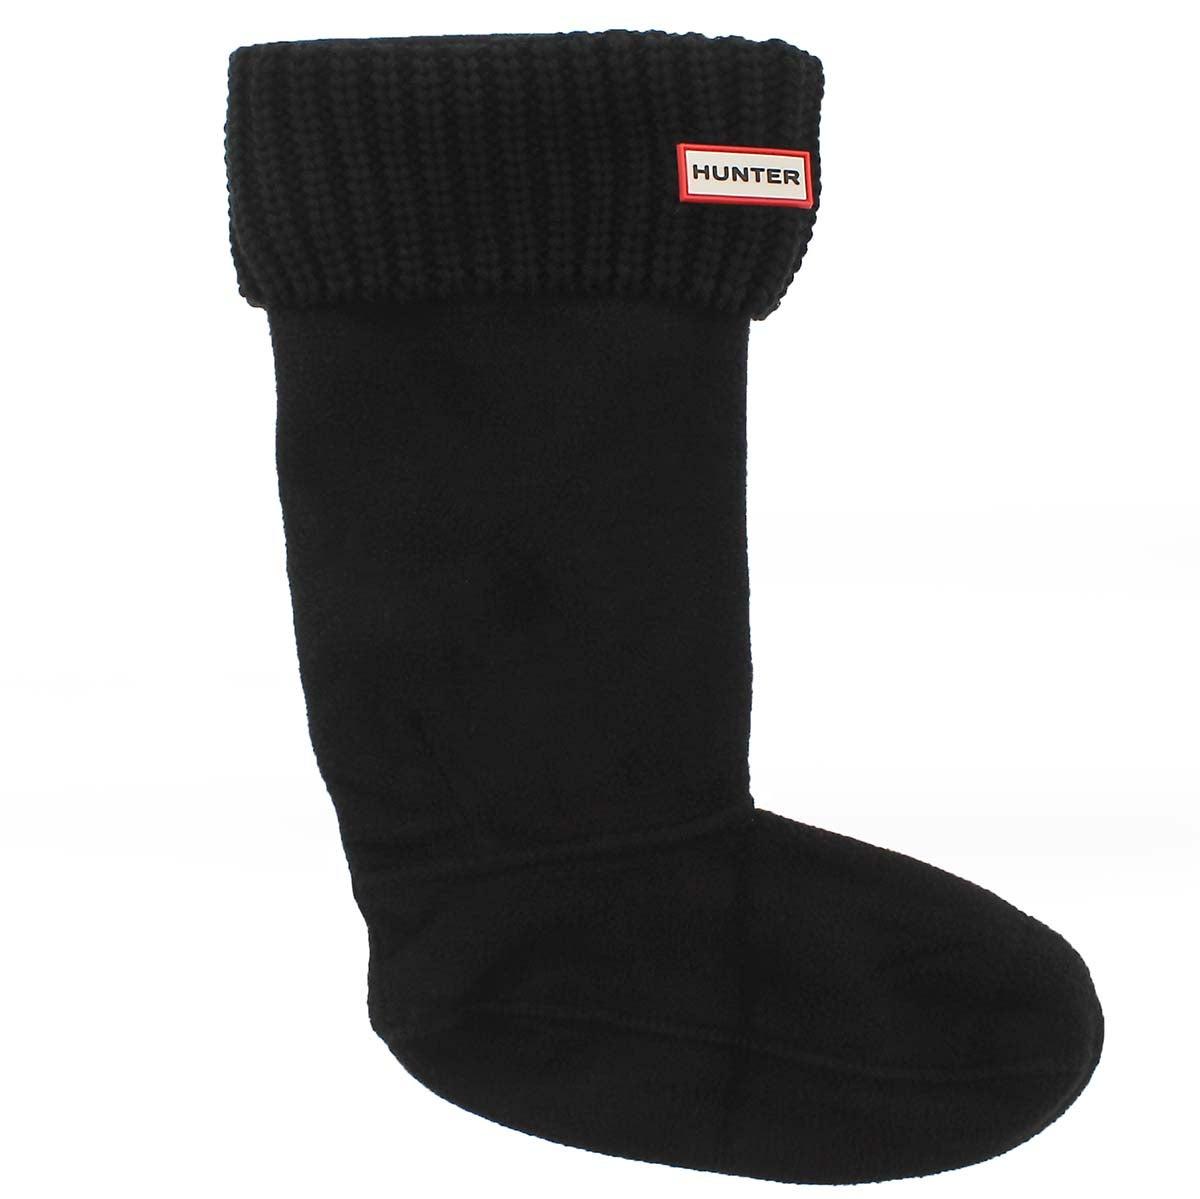 Lds Half Cardigan blk boot sock